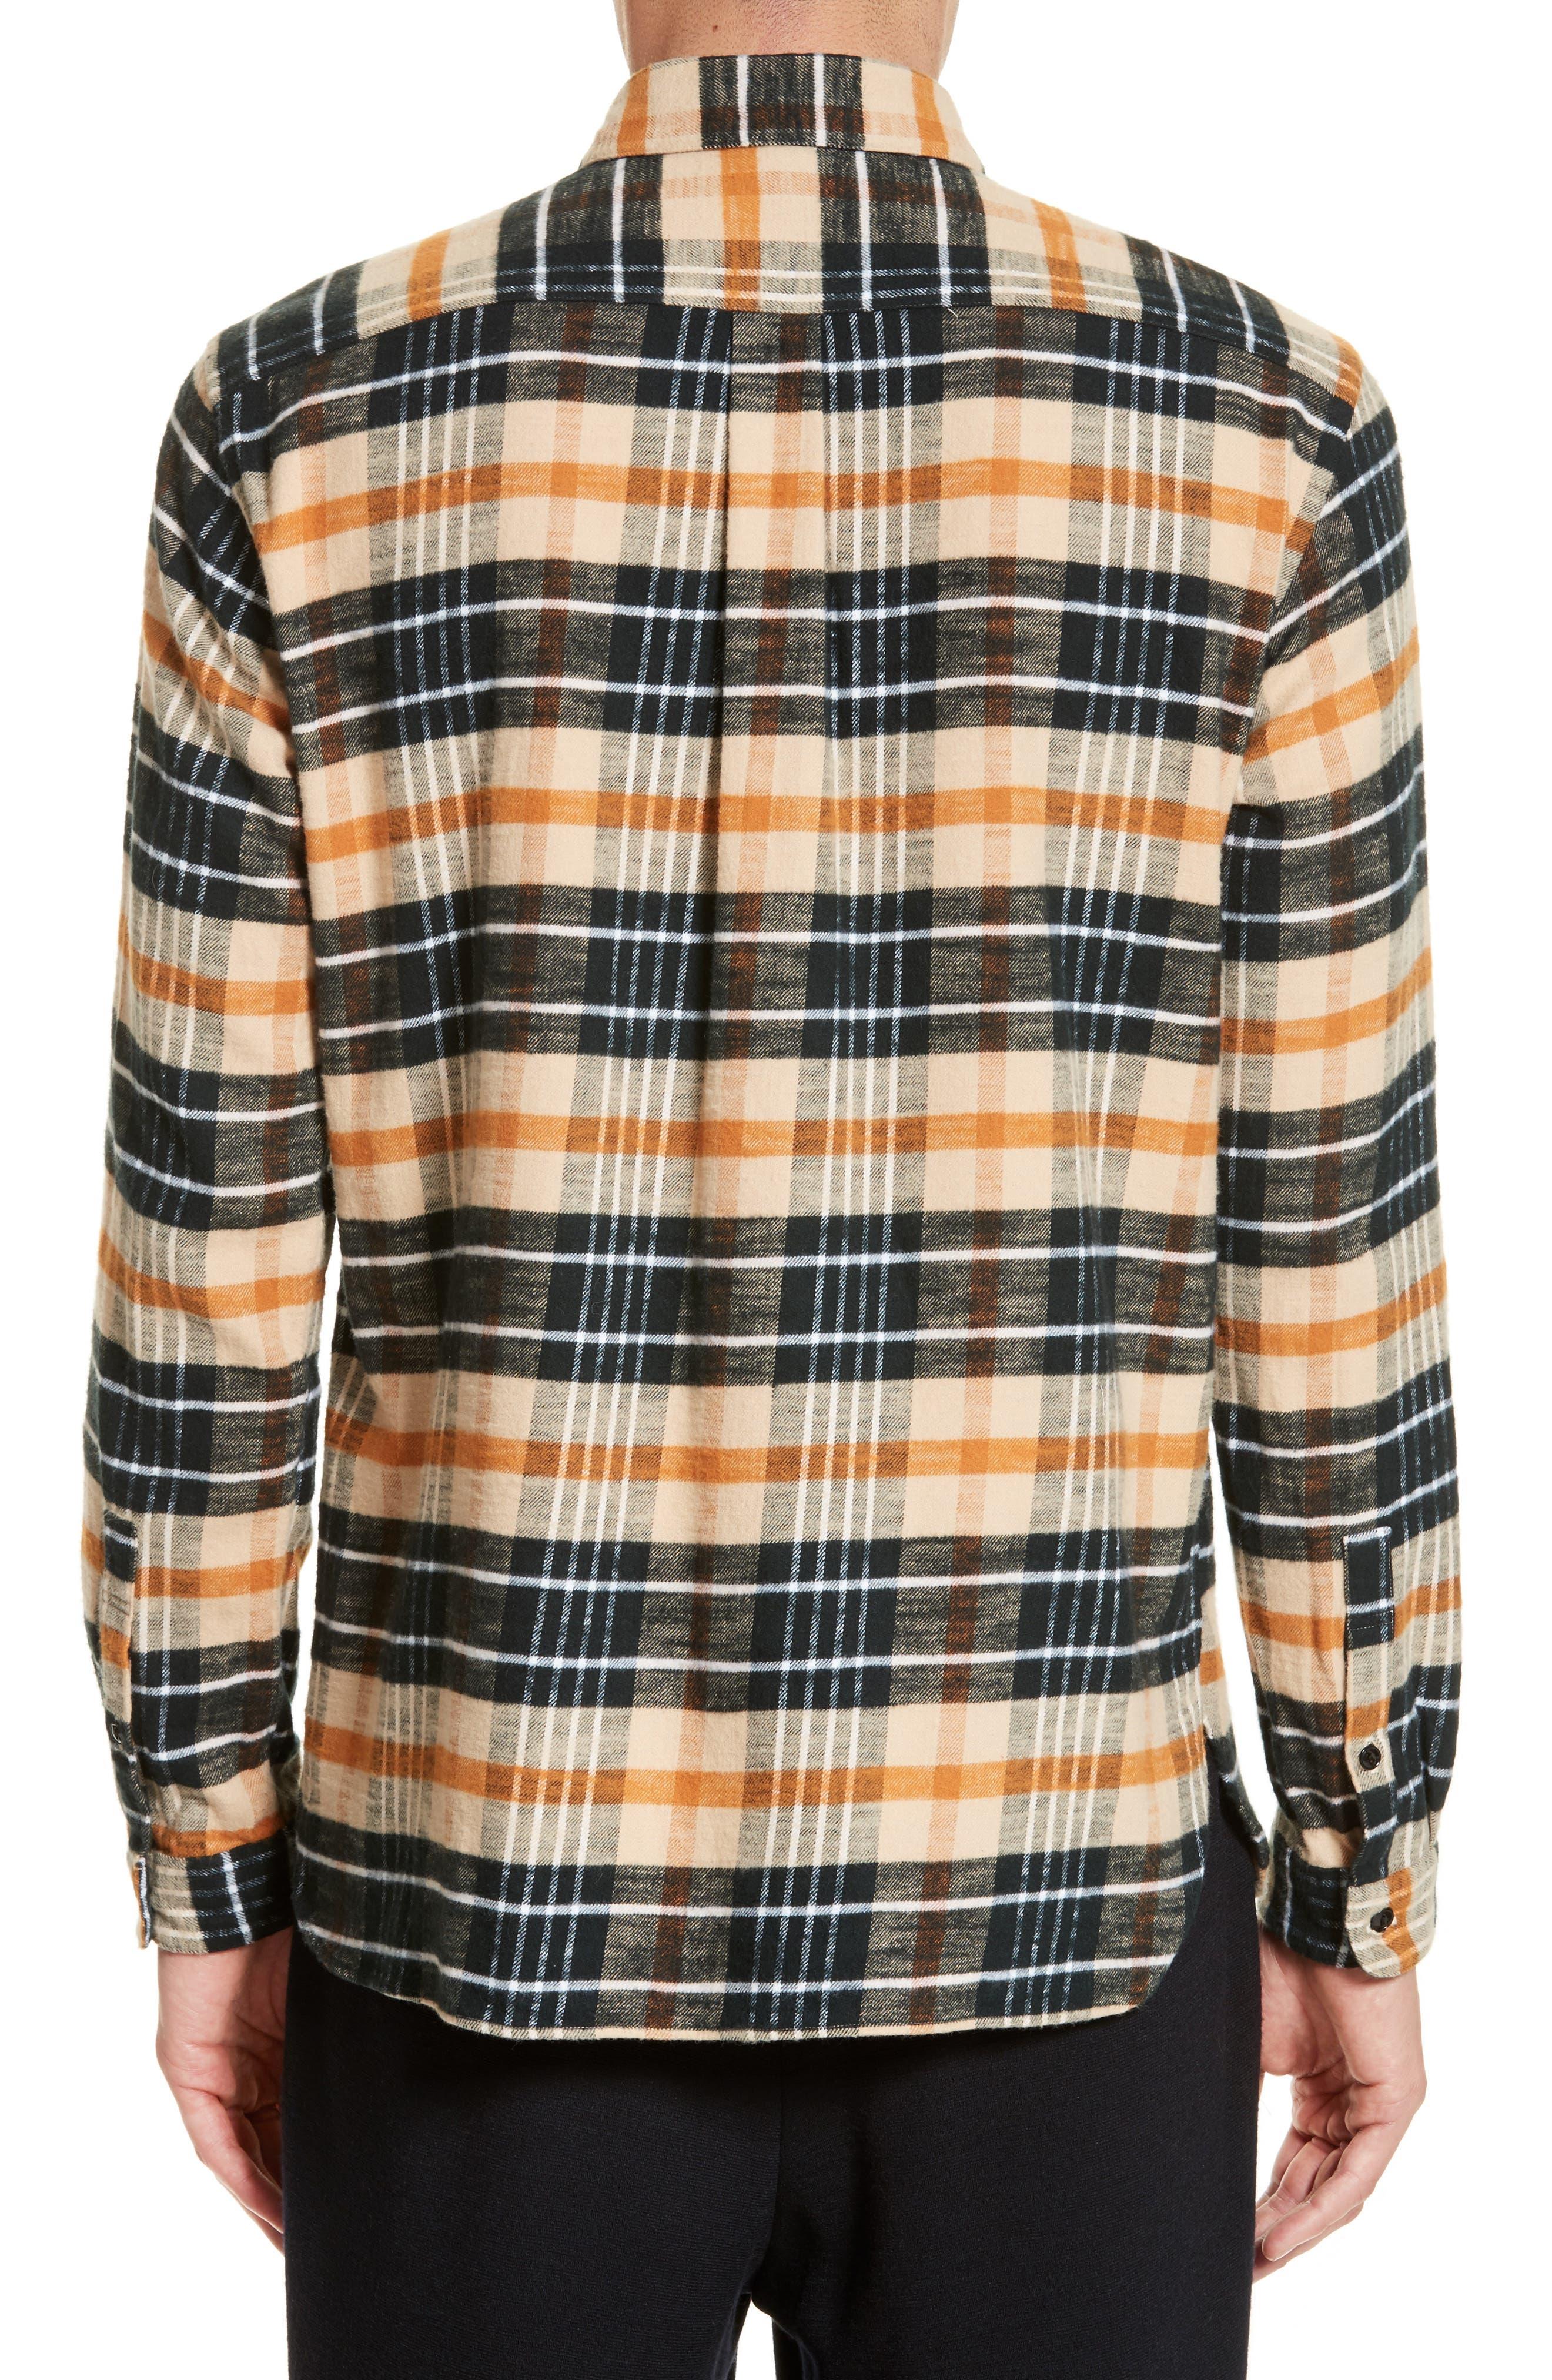 Bradford Plaid Flannel Sport Shirt,                             Alternate thumbnail 2, color,                             270